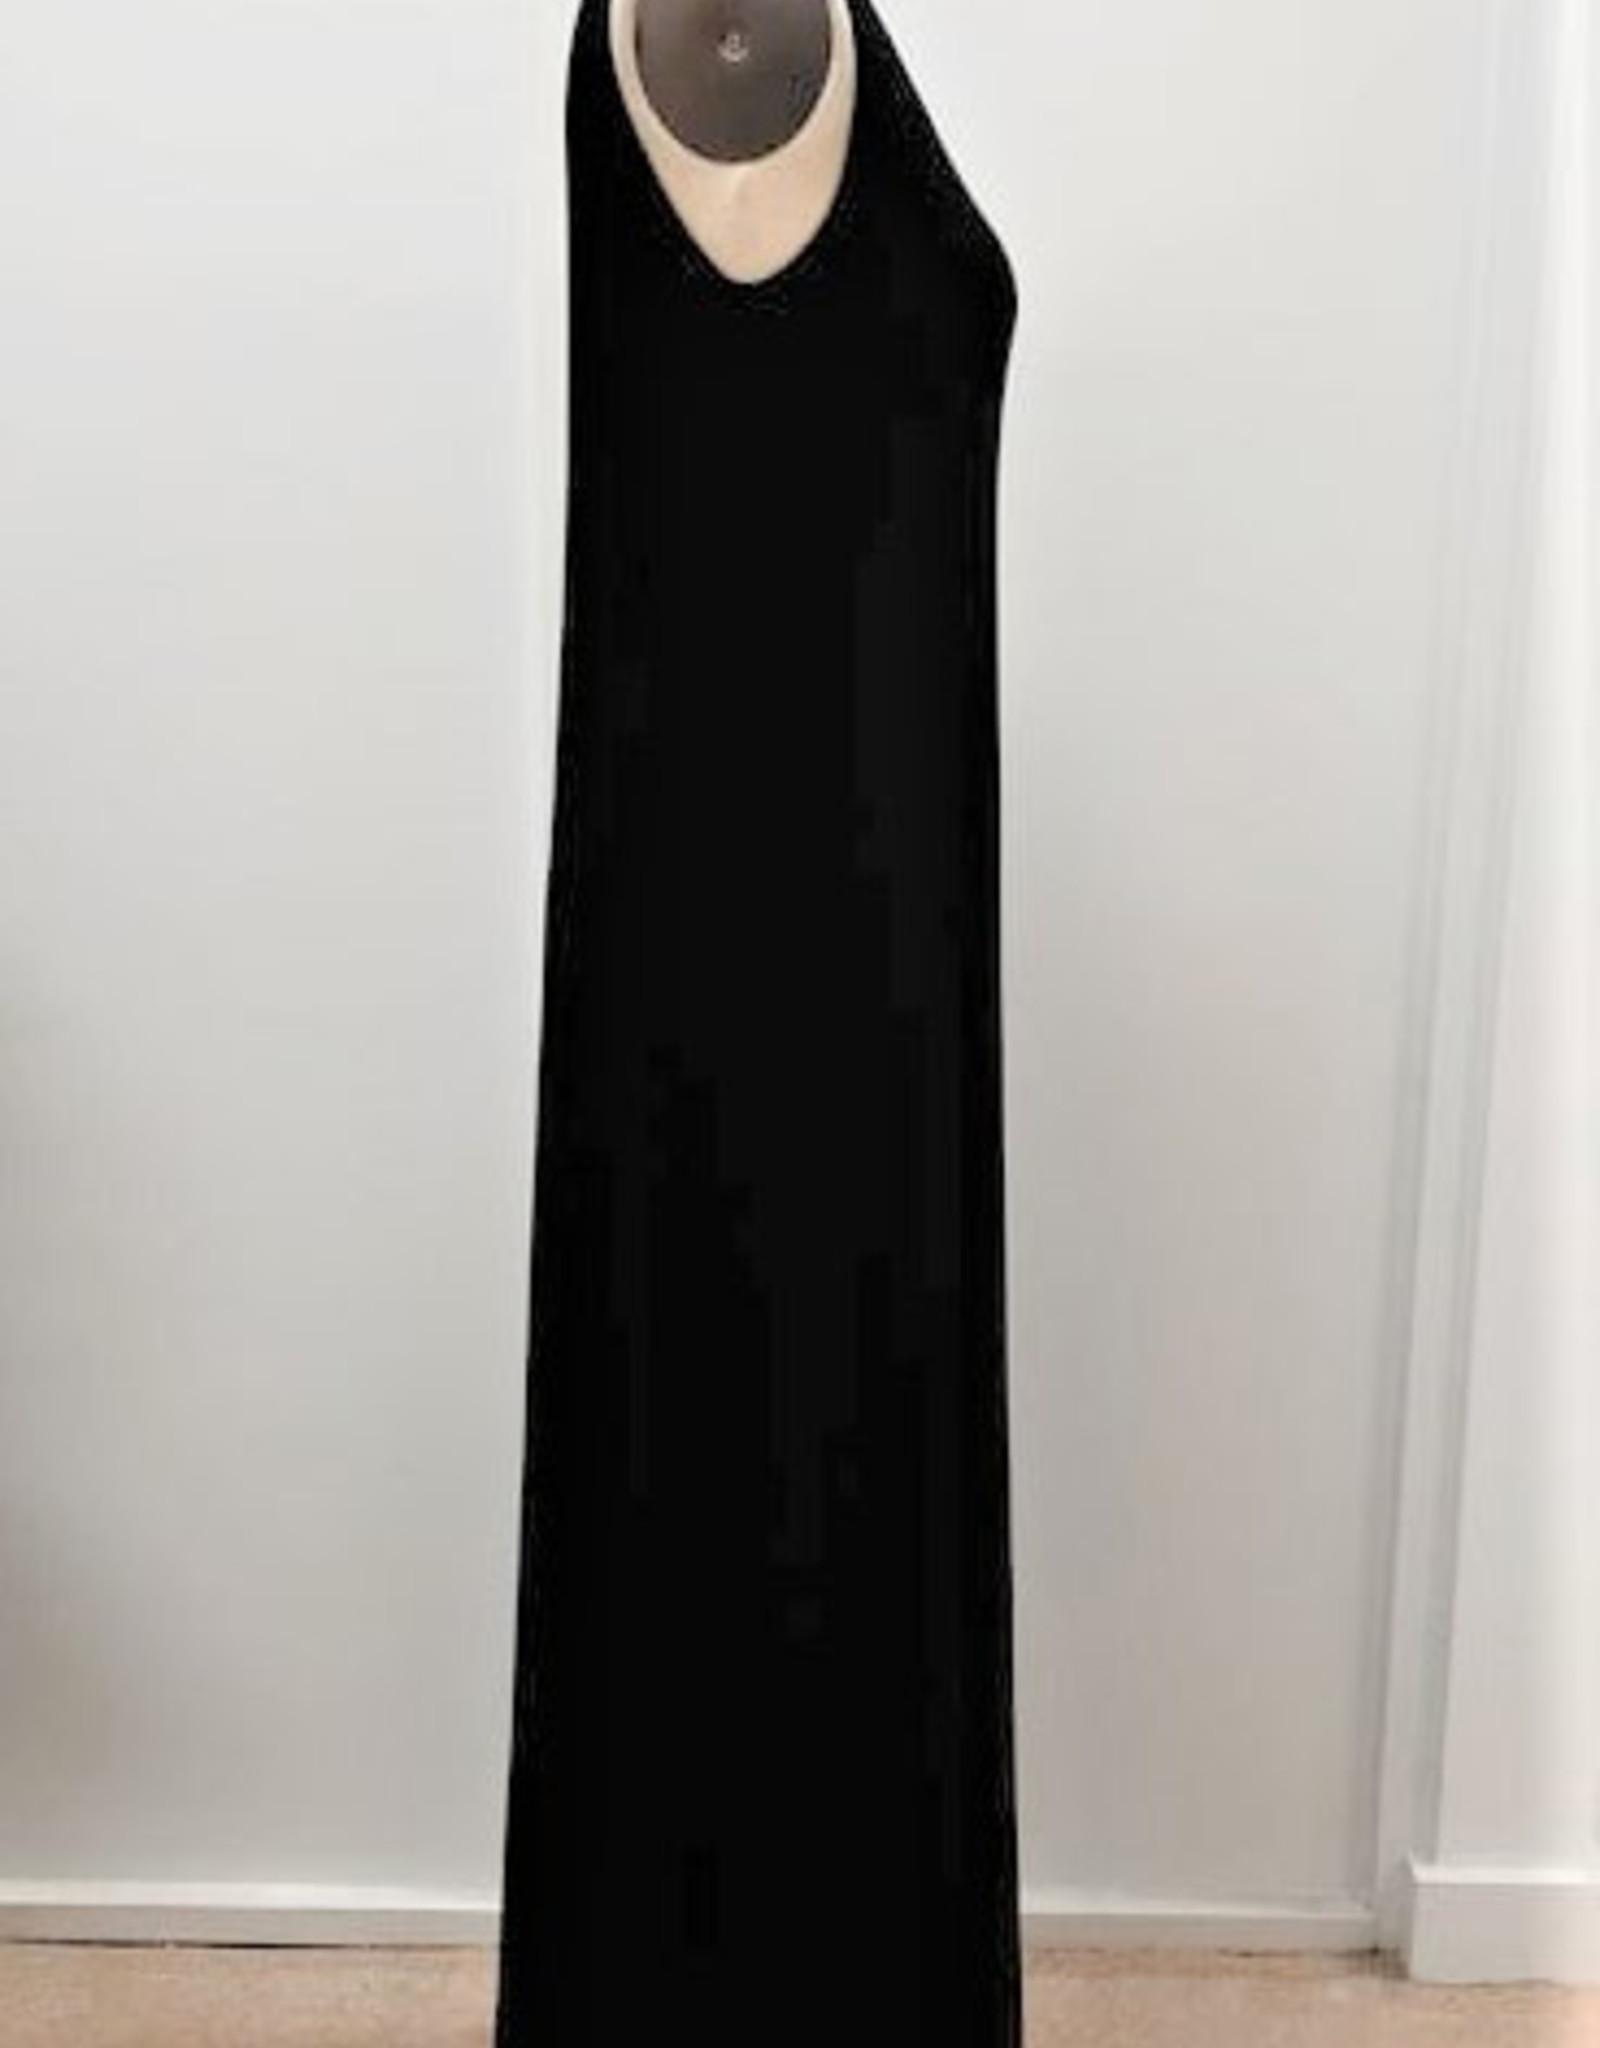 Sympli Tank Dress Long - Size 8 (Consignment)